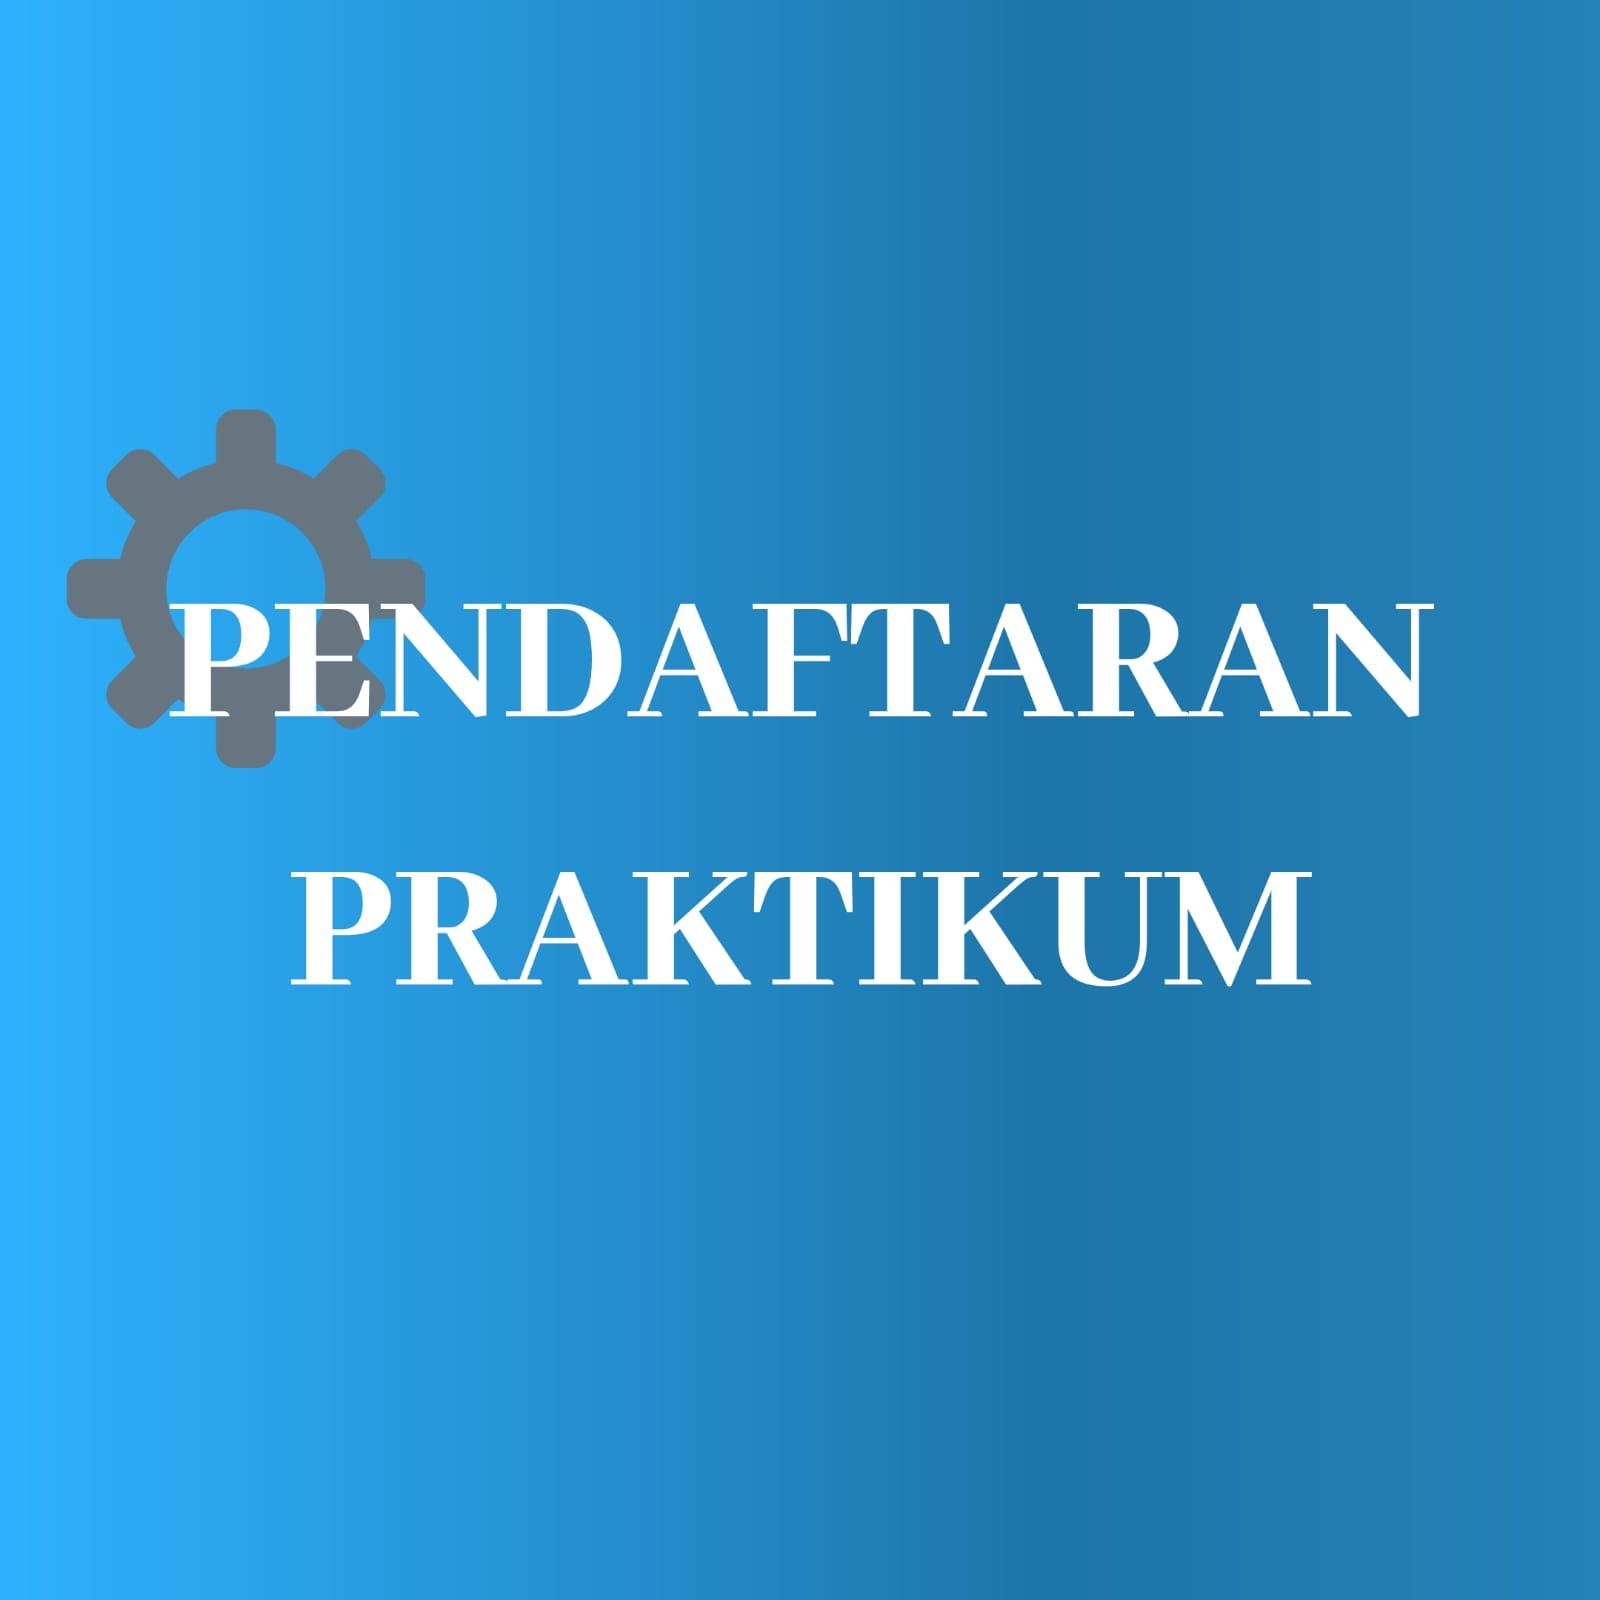 Pendaftaran Praktikum PTLF Sem Genap 2020/2021